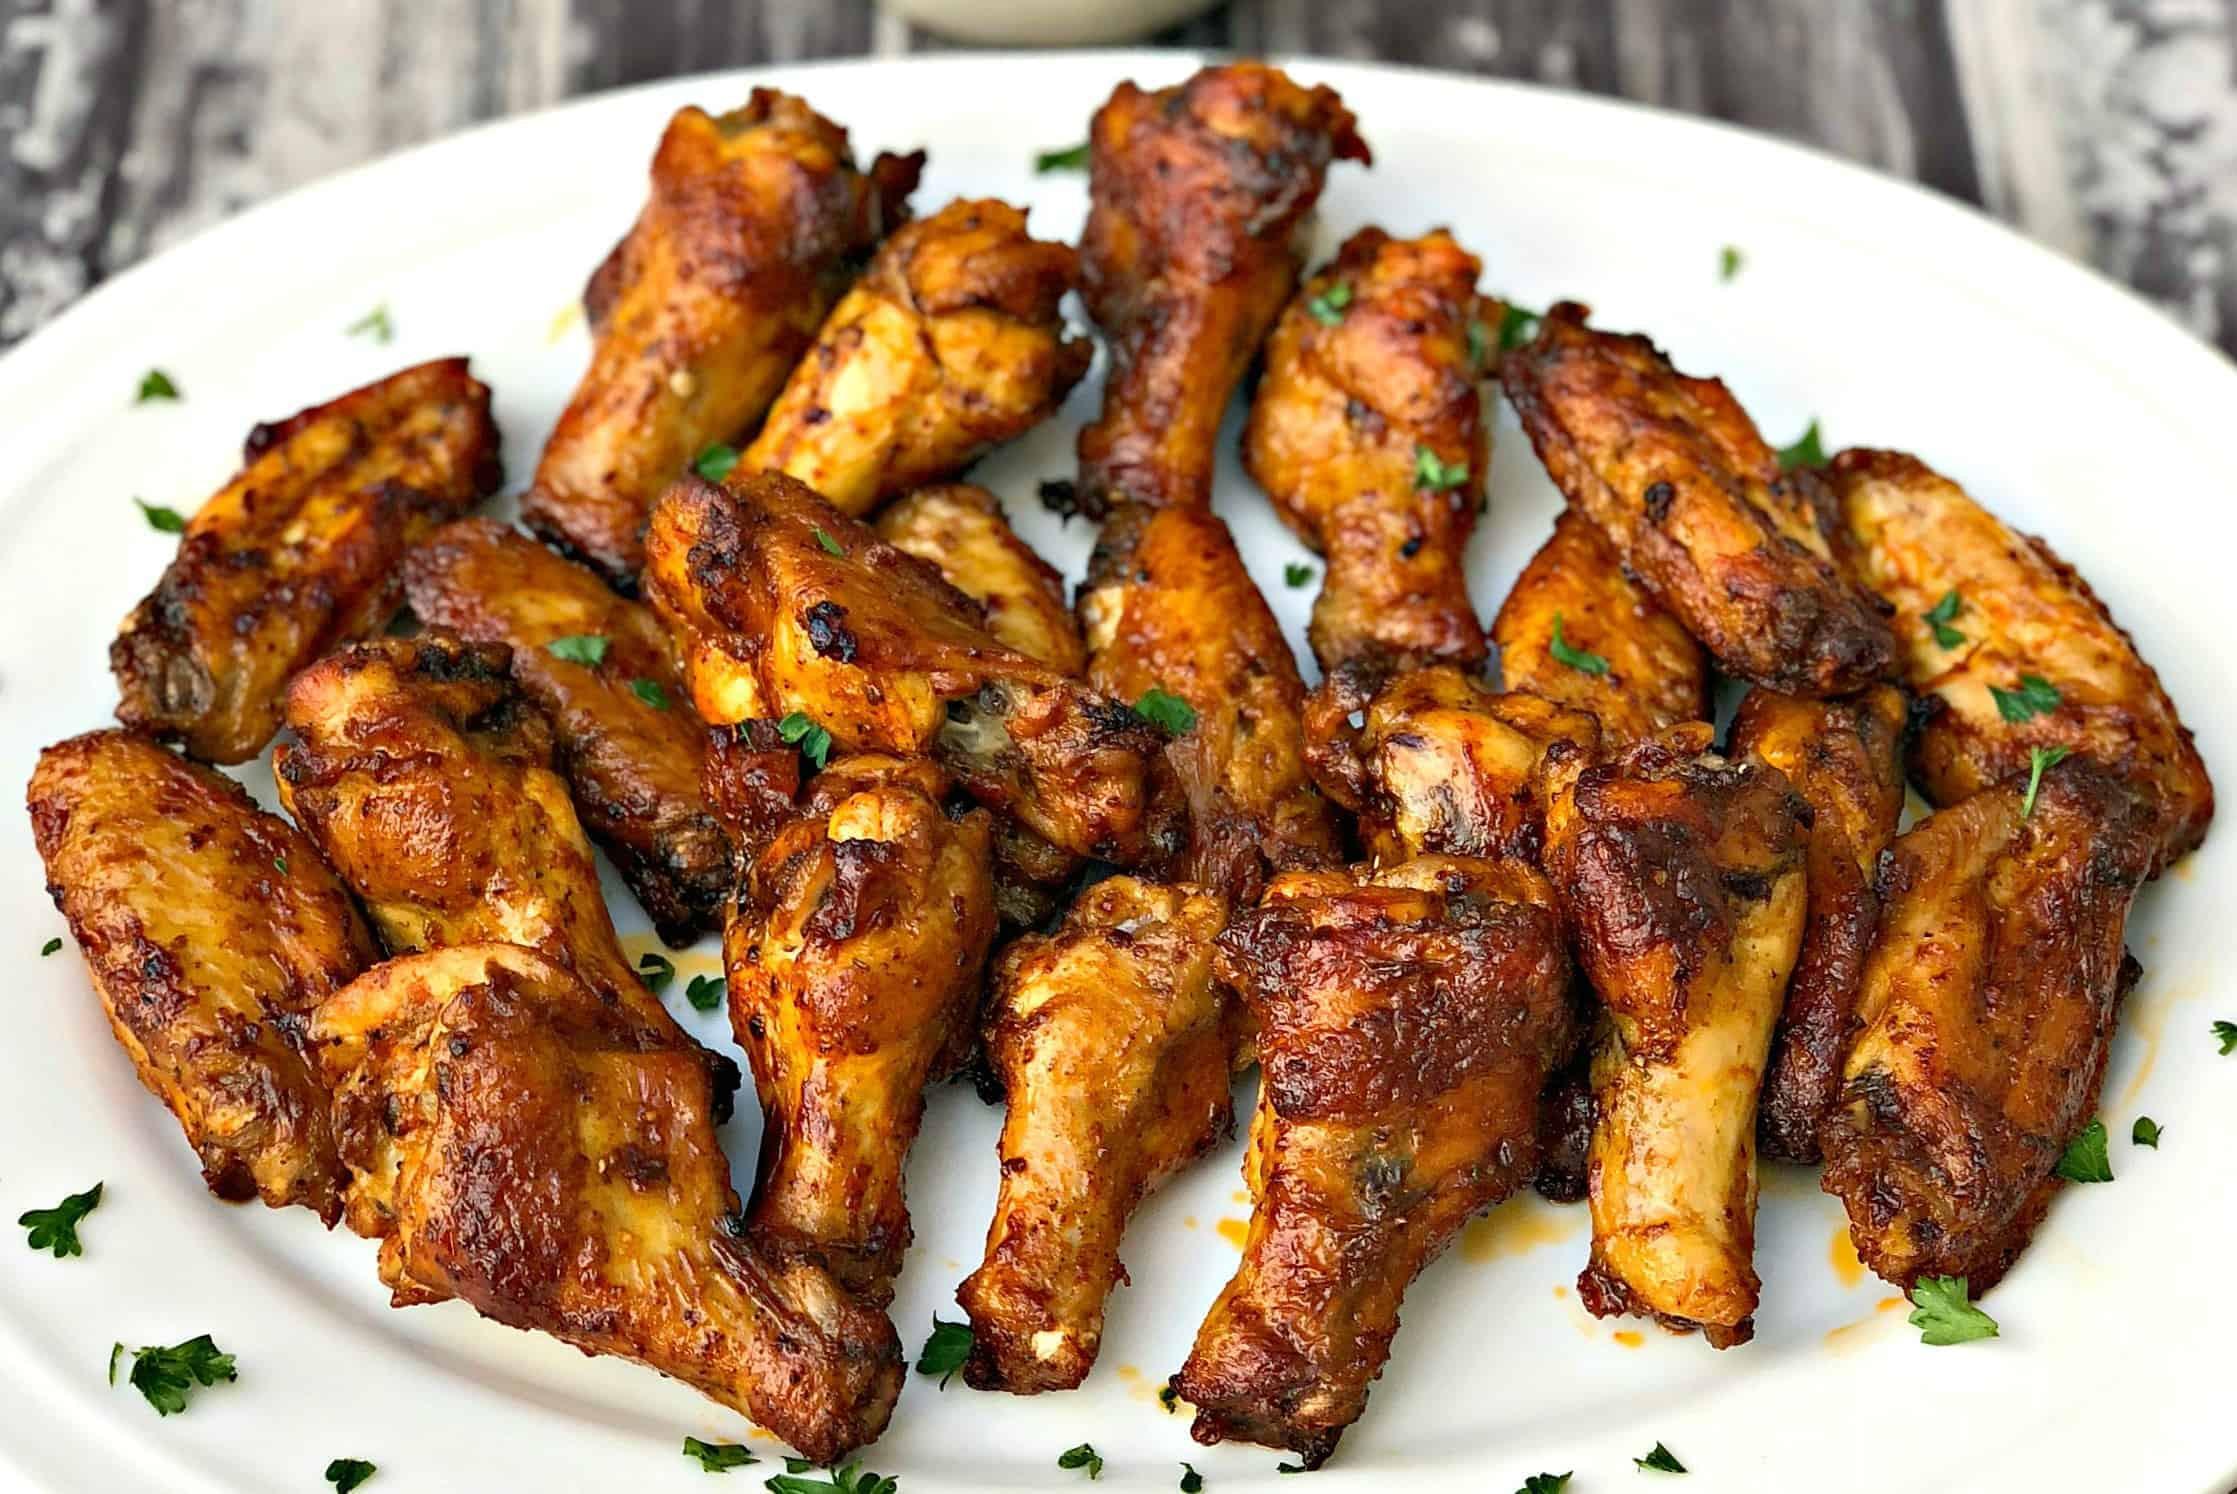 Air Fryer Keto Chicken Wings  Air Fryer Crispy Buffalo Chicken Hot Wings Keto Low Carb